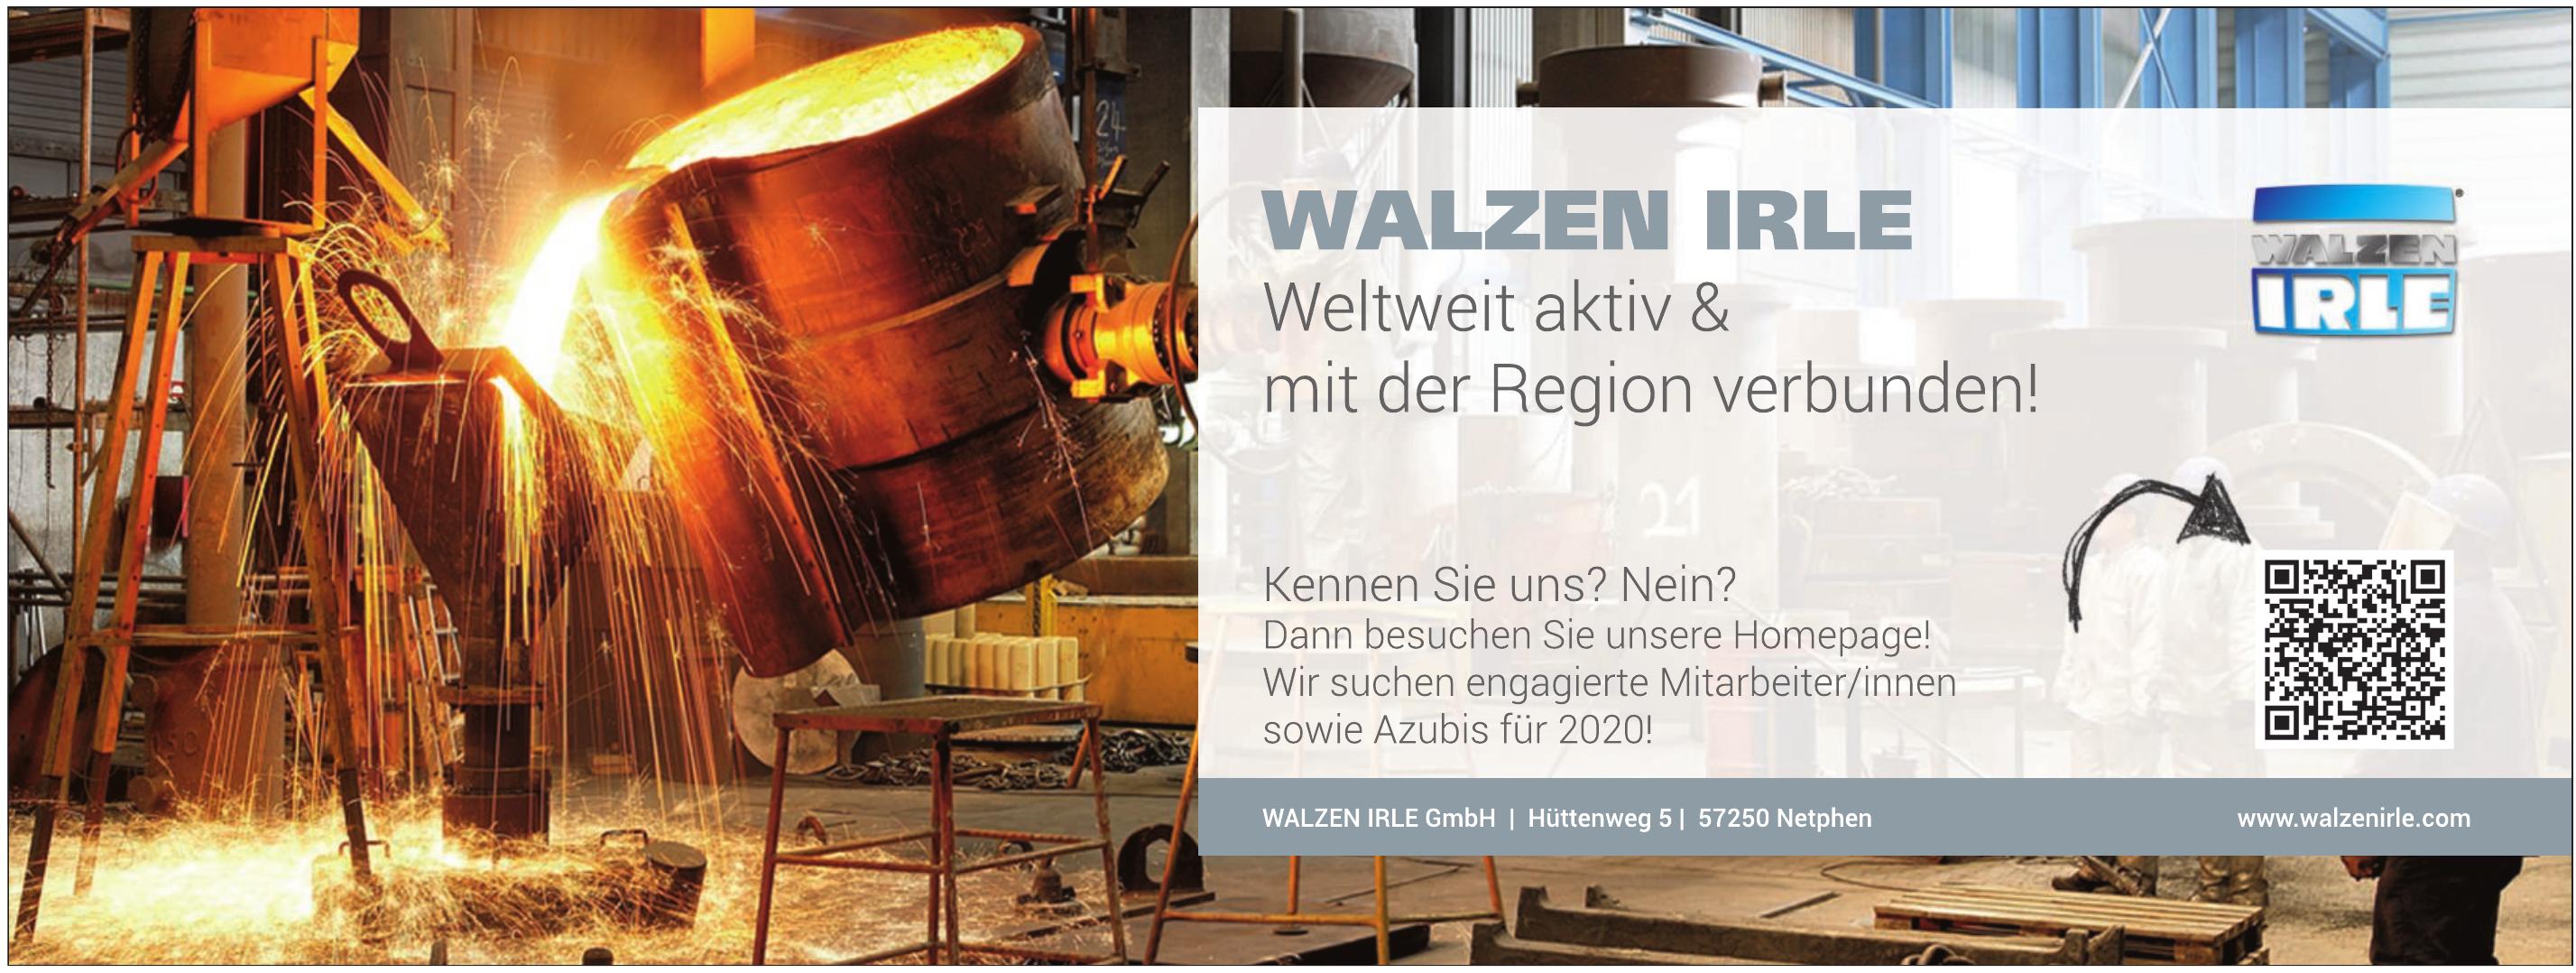 Walzen Irle GmbH